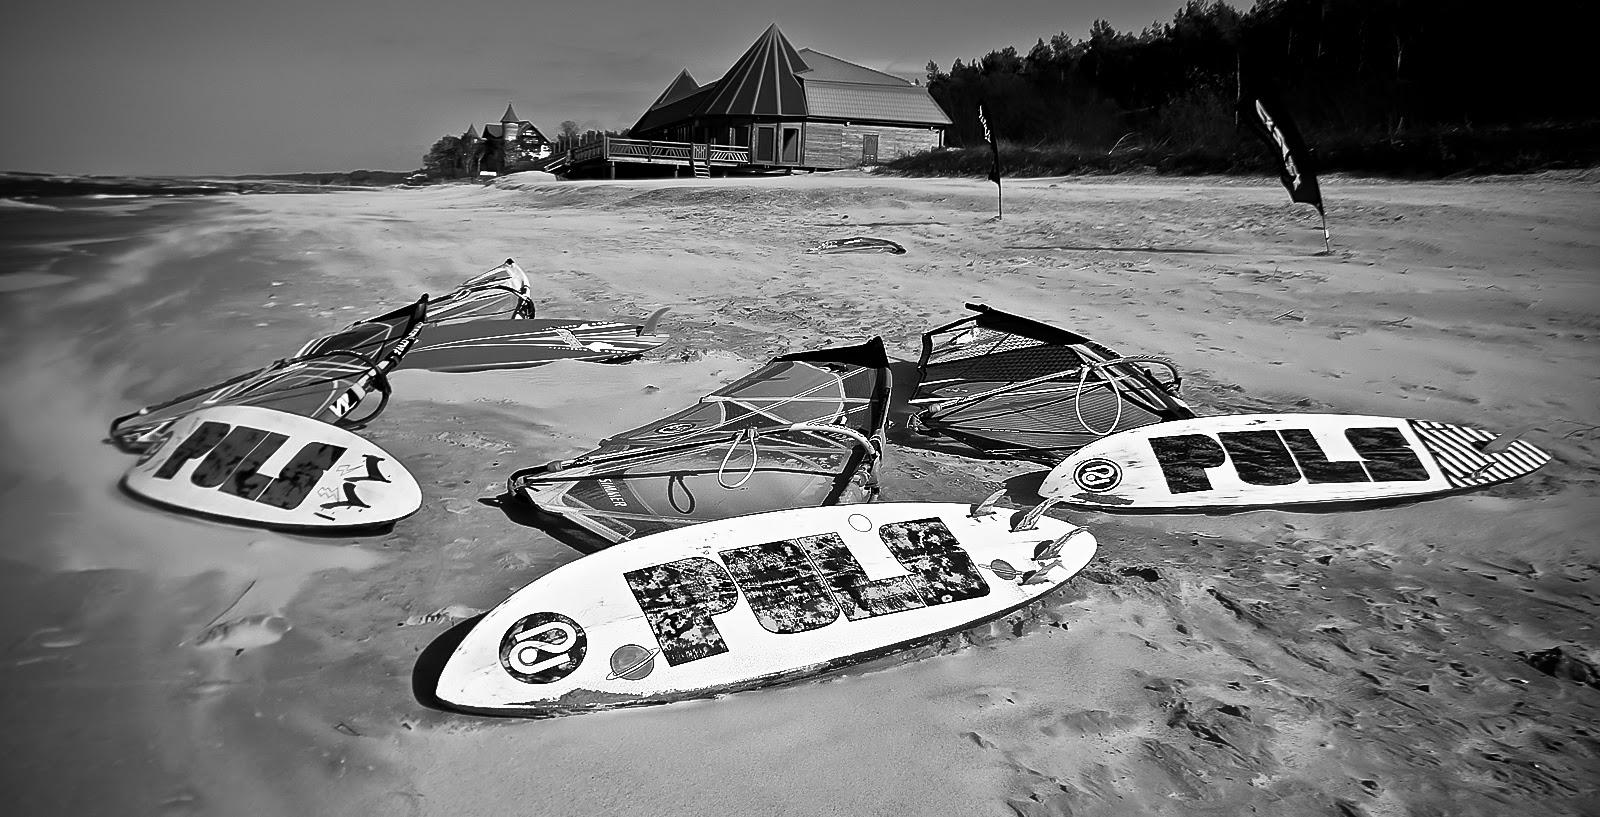 PULS Boards, fot. Iza Guga-Marek